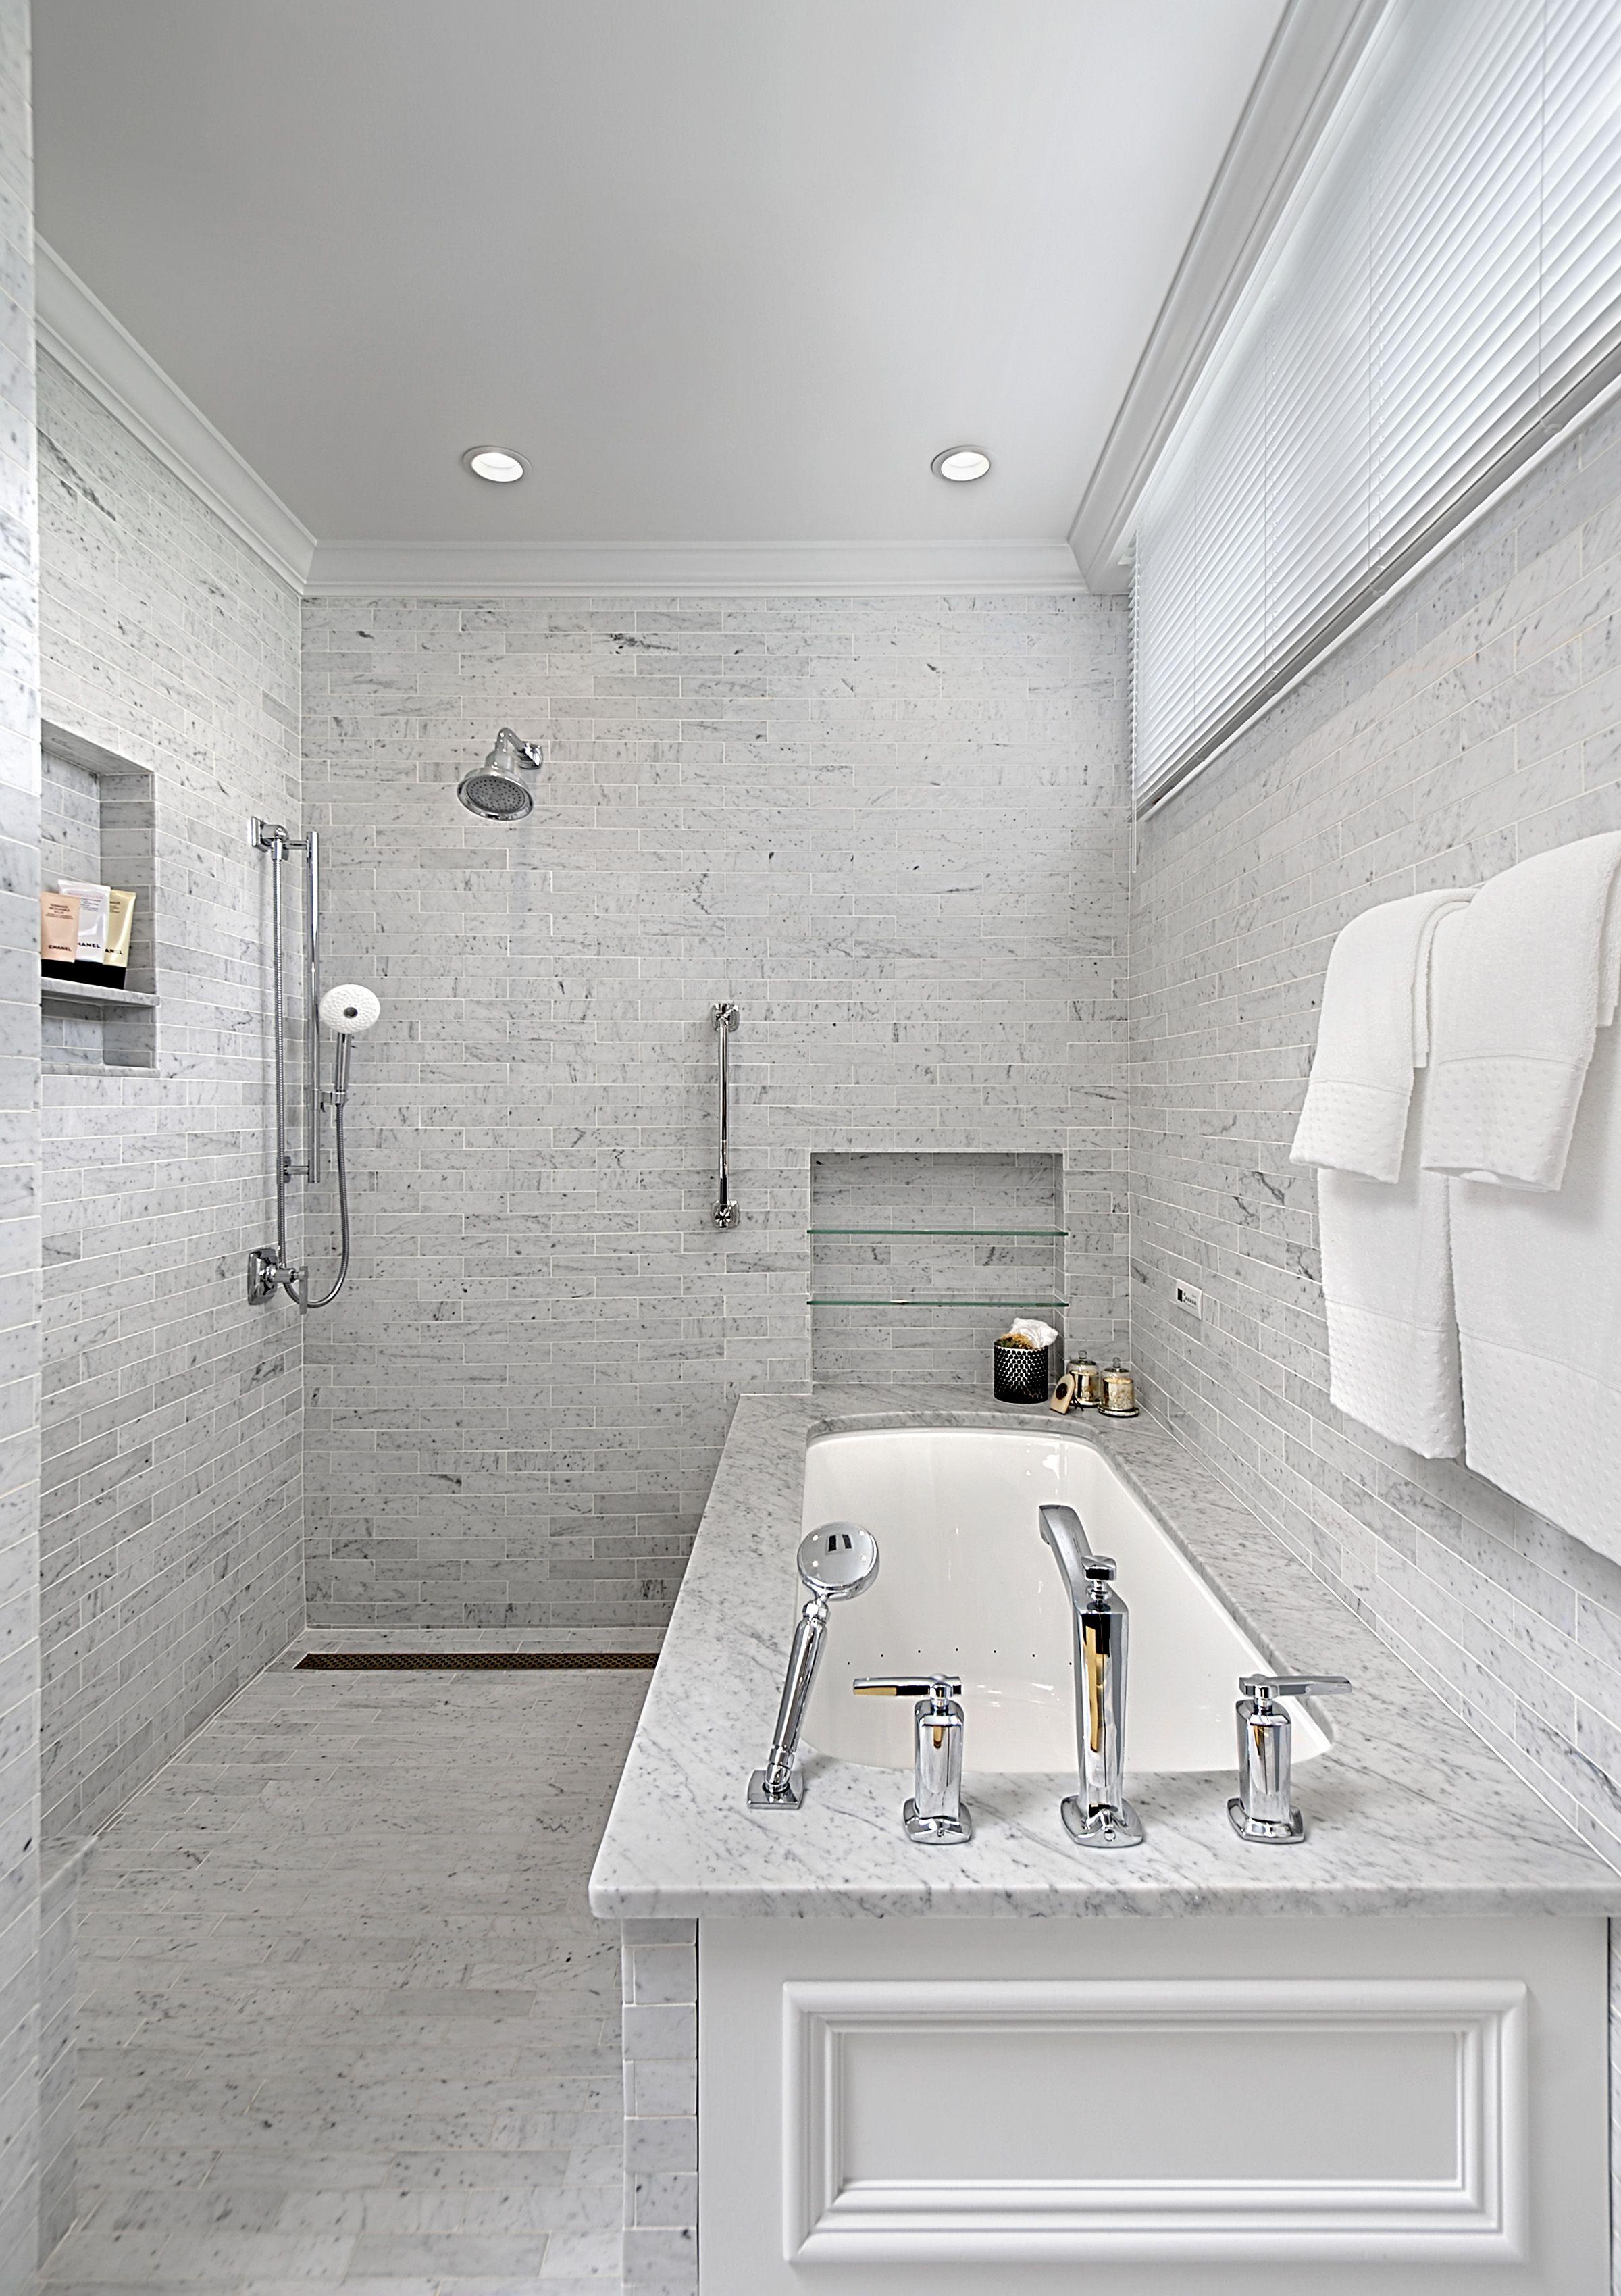 Bathroom Remodel Chicago Gold Coast Bathroom Shower Design Doorless Shower Doorless Shower Design